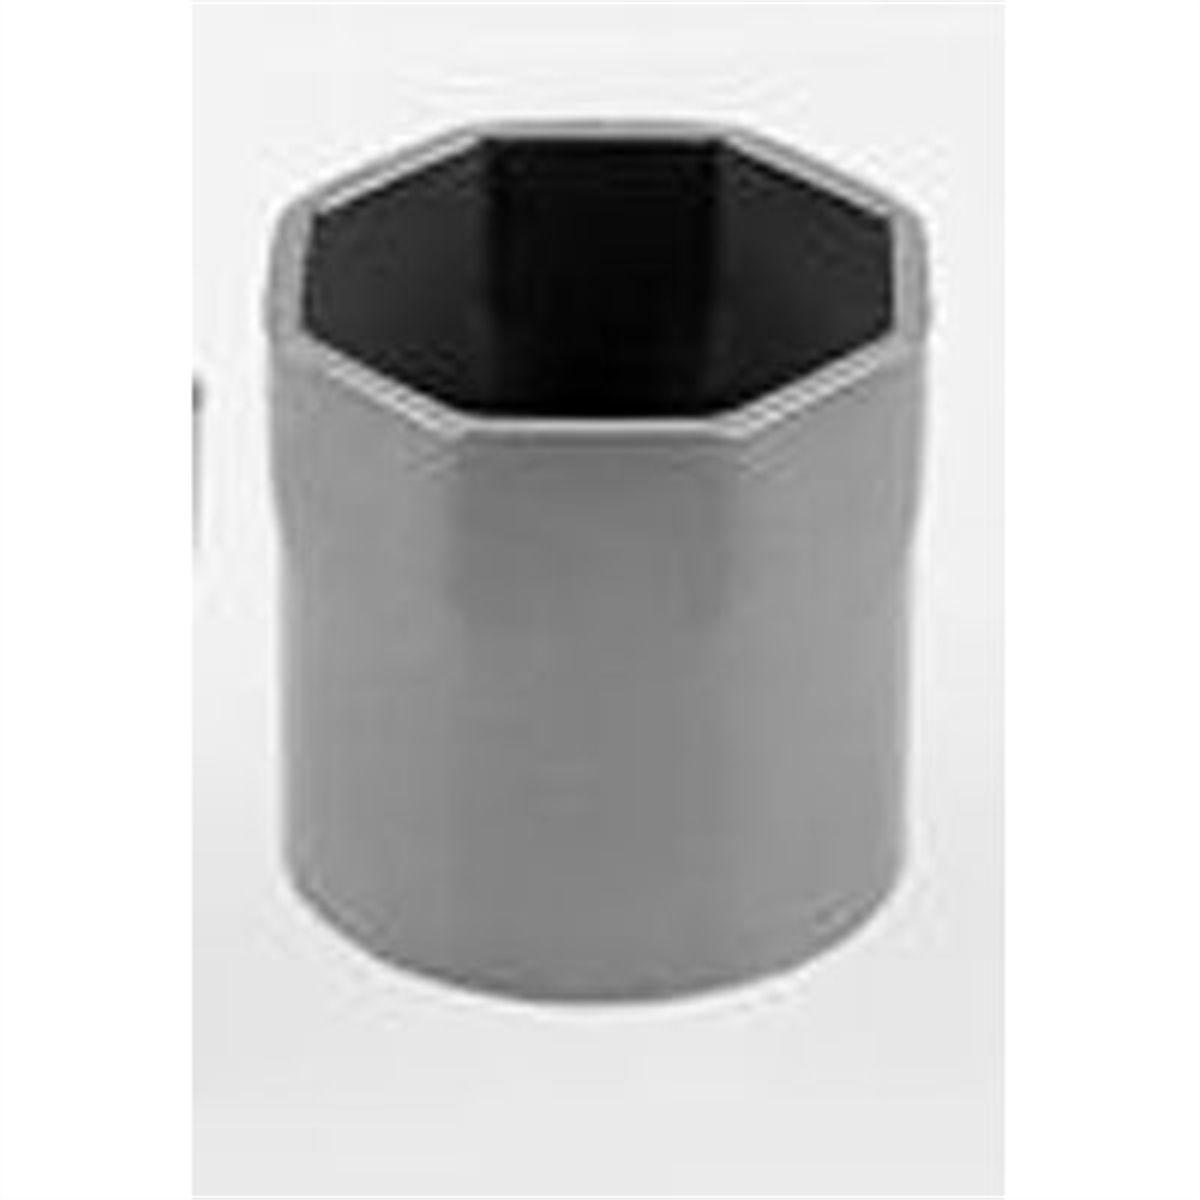 Sunex 2800 1//2-Inch Drive 30-mm Deep Spindle Nut Impact Socket